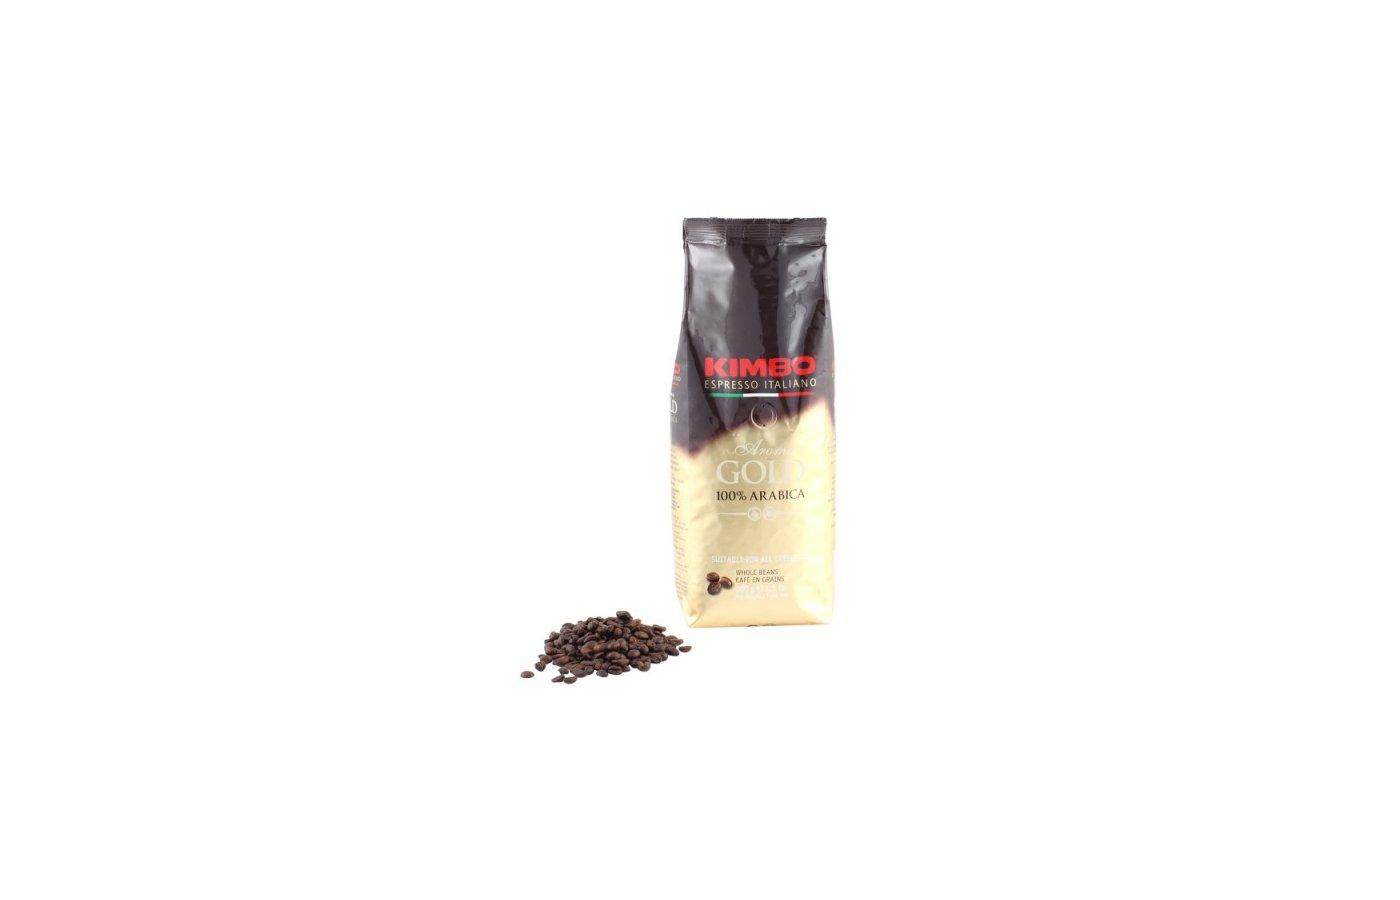 Кофе в зернах KIMBO Aroma Gold Arabica 500гр пак. с клап.